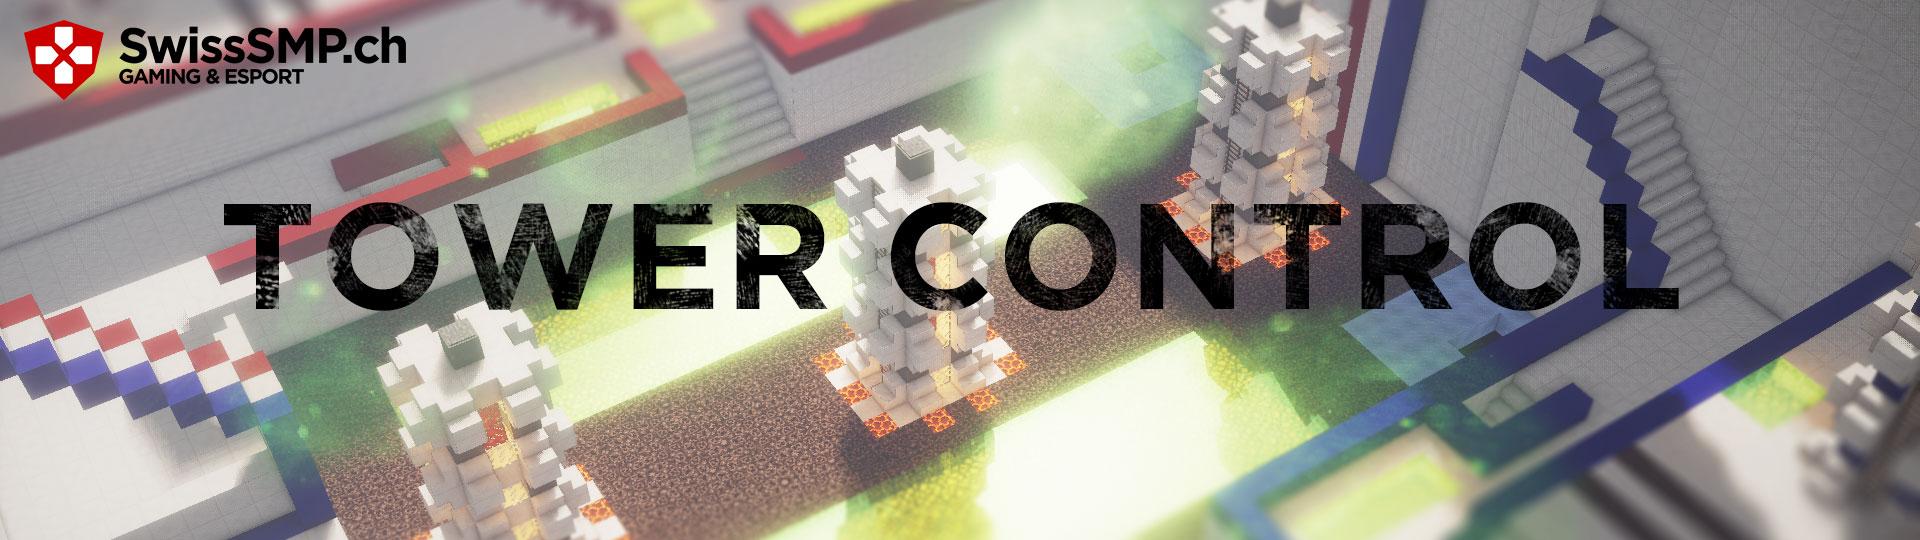 TowerControl_Banner.jpg